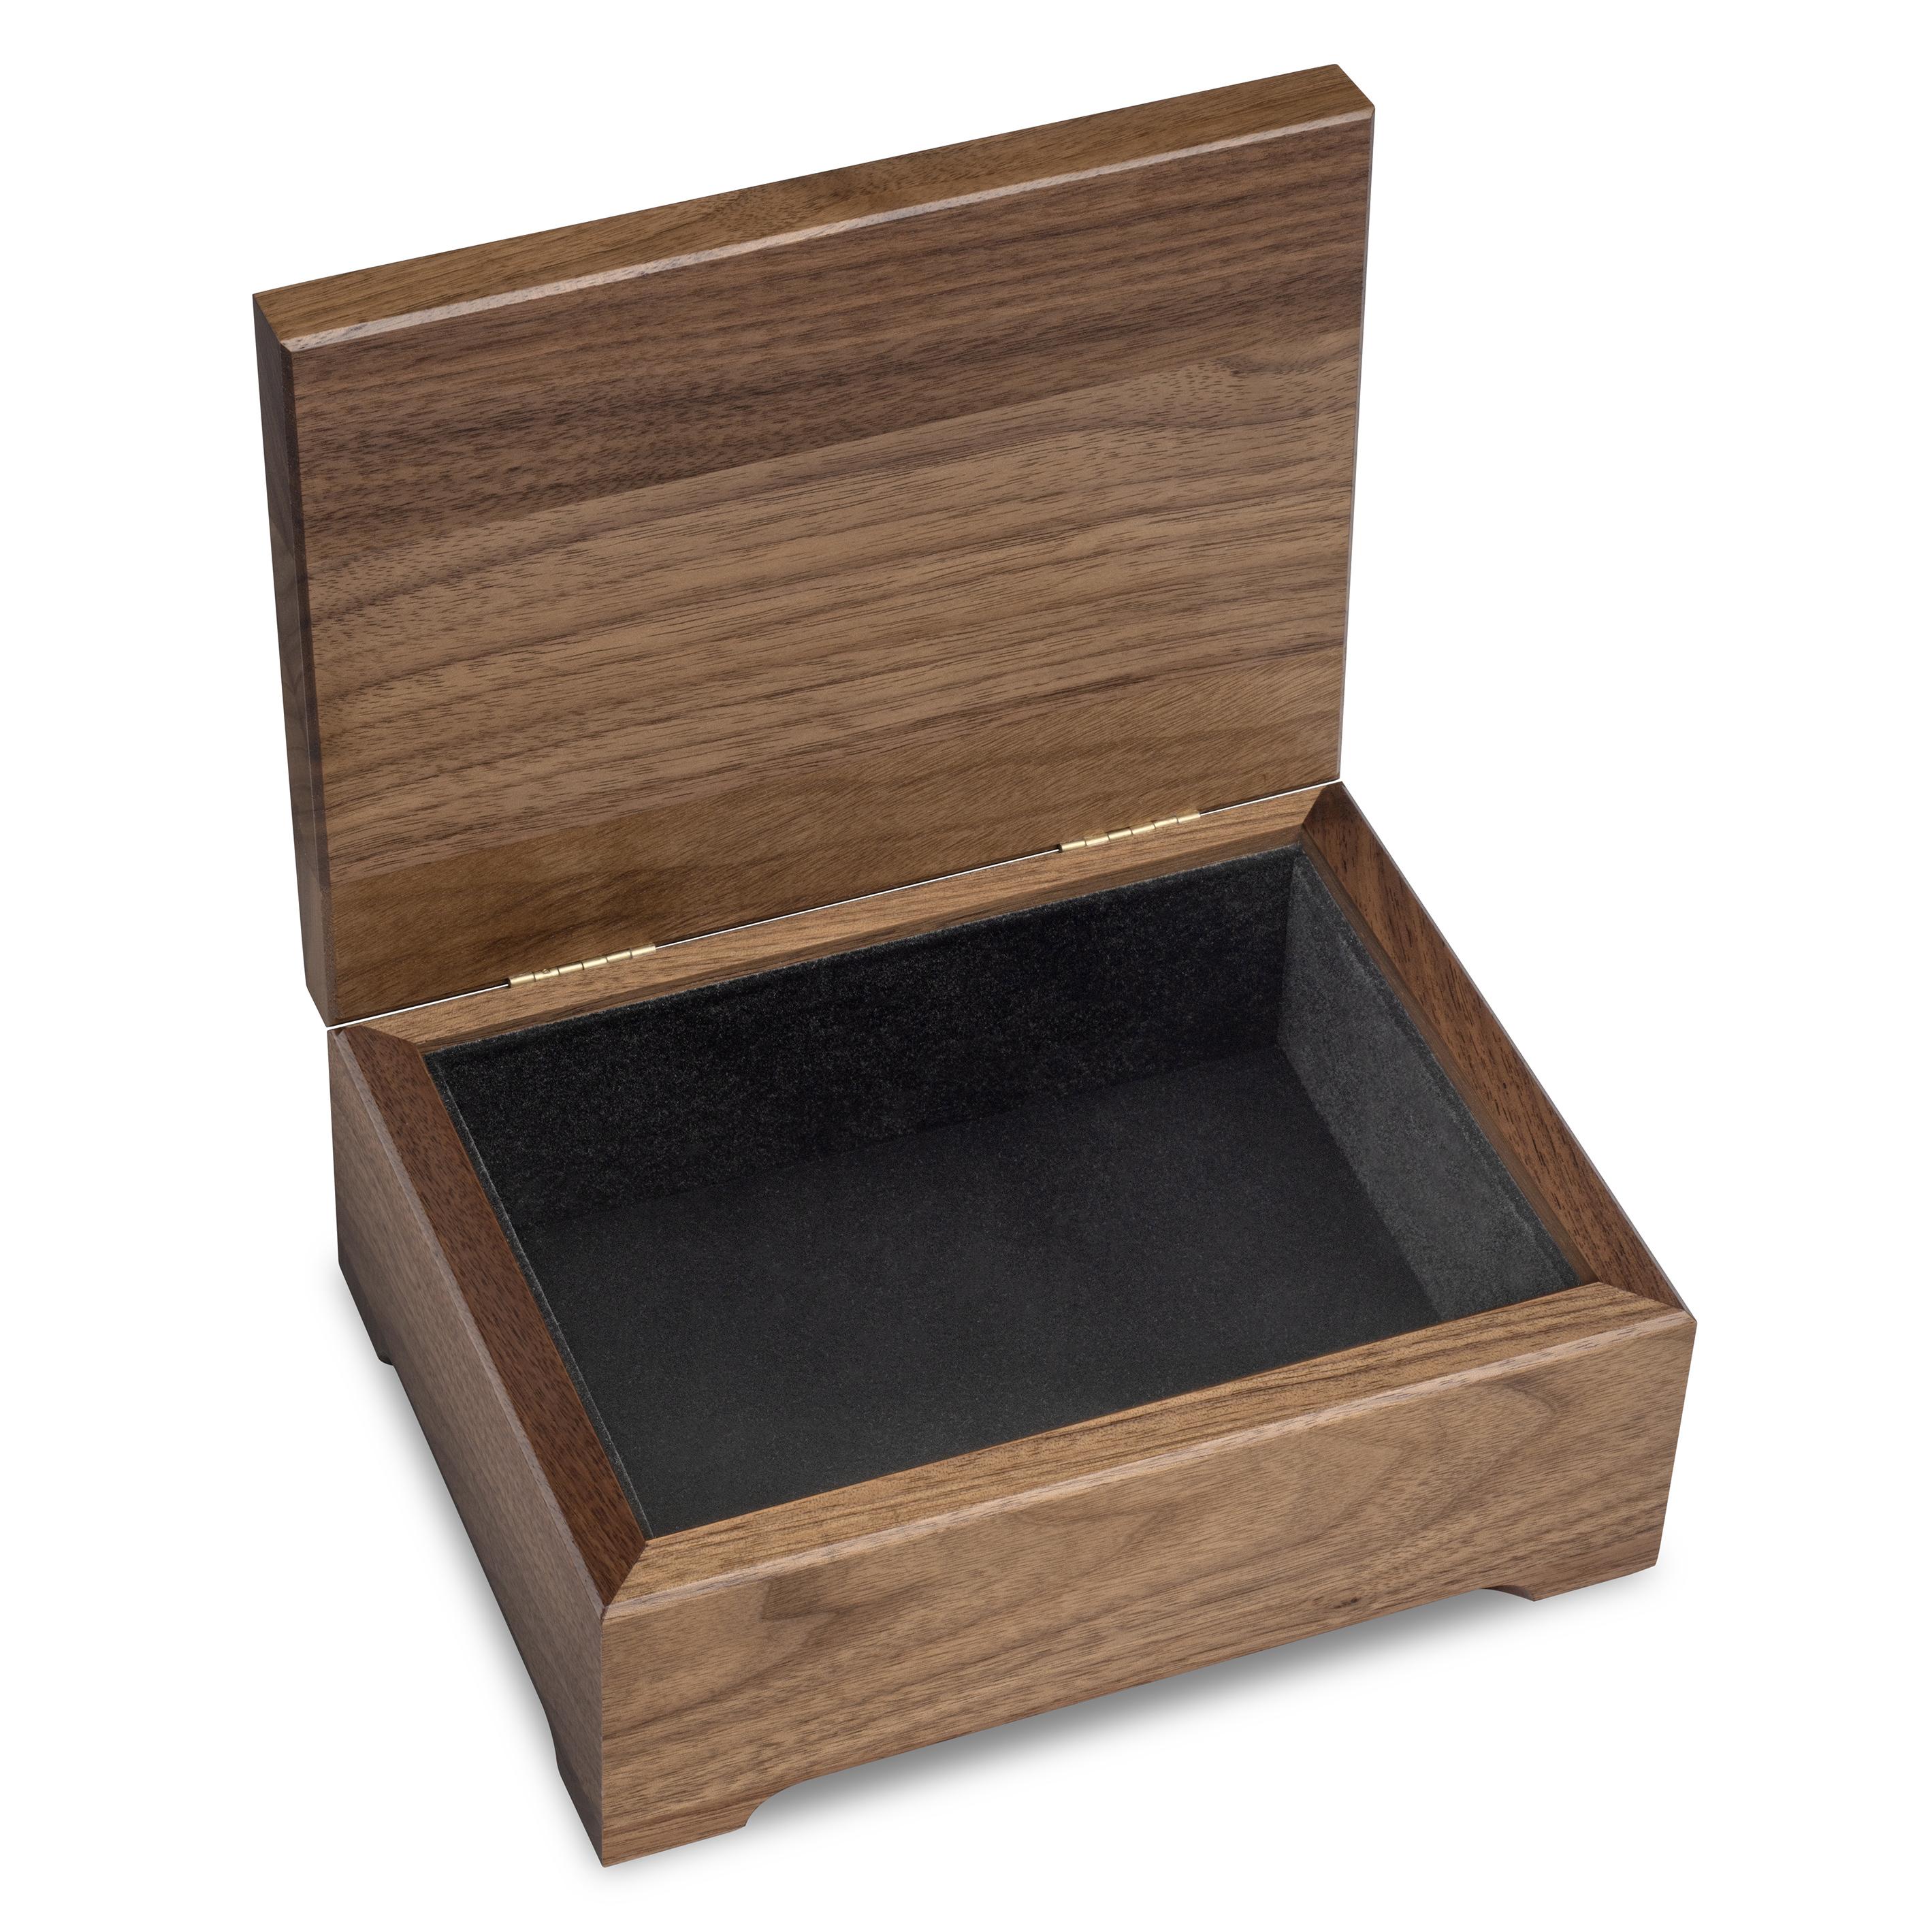 University of Richmond Solid Walnut Desk Box - Image 2